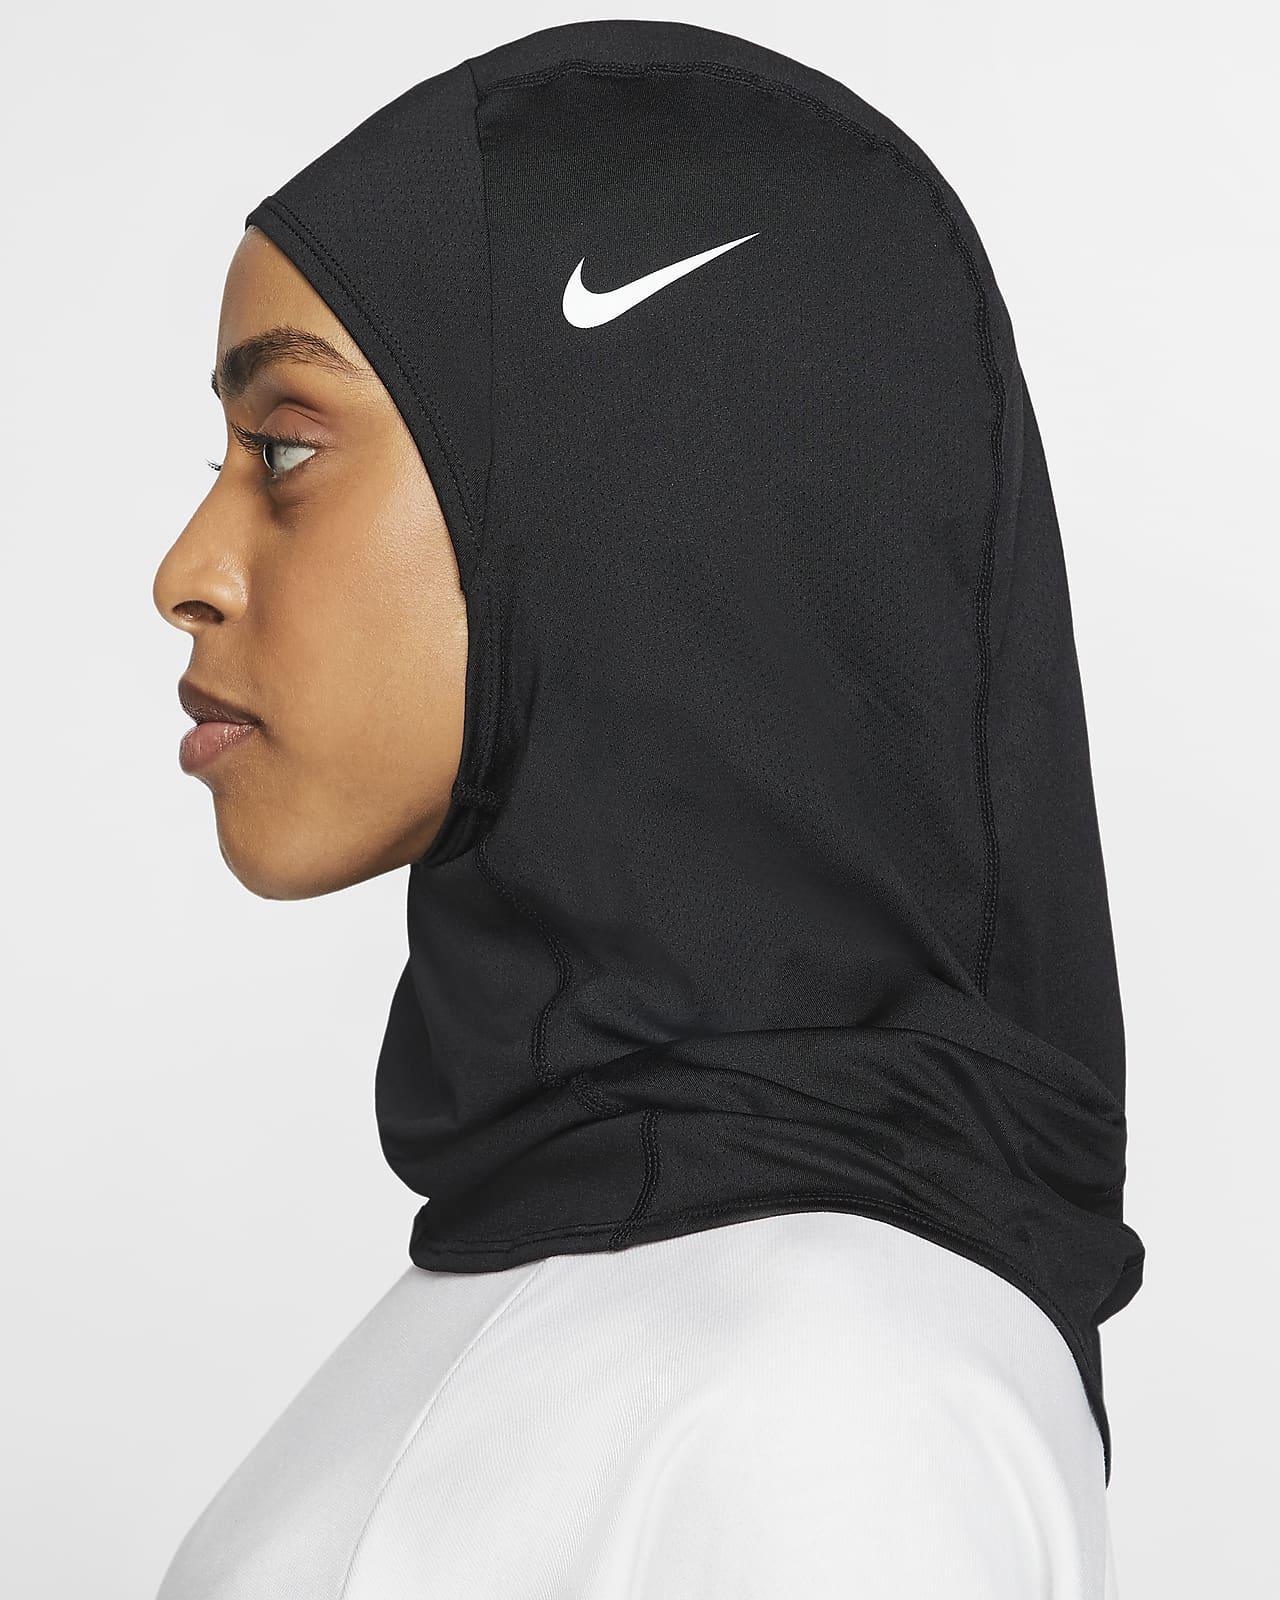 Cornualles Alergia Besugo  Nike Pro Hijab 2.0. Nike NL